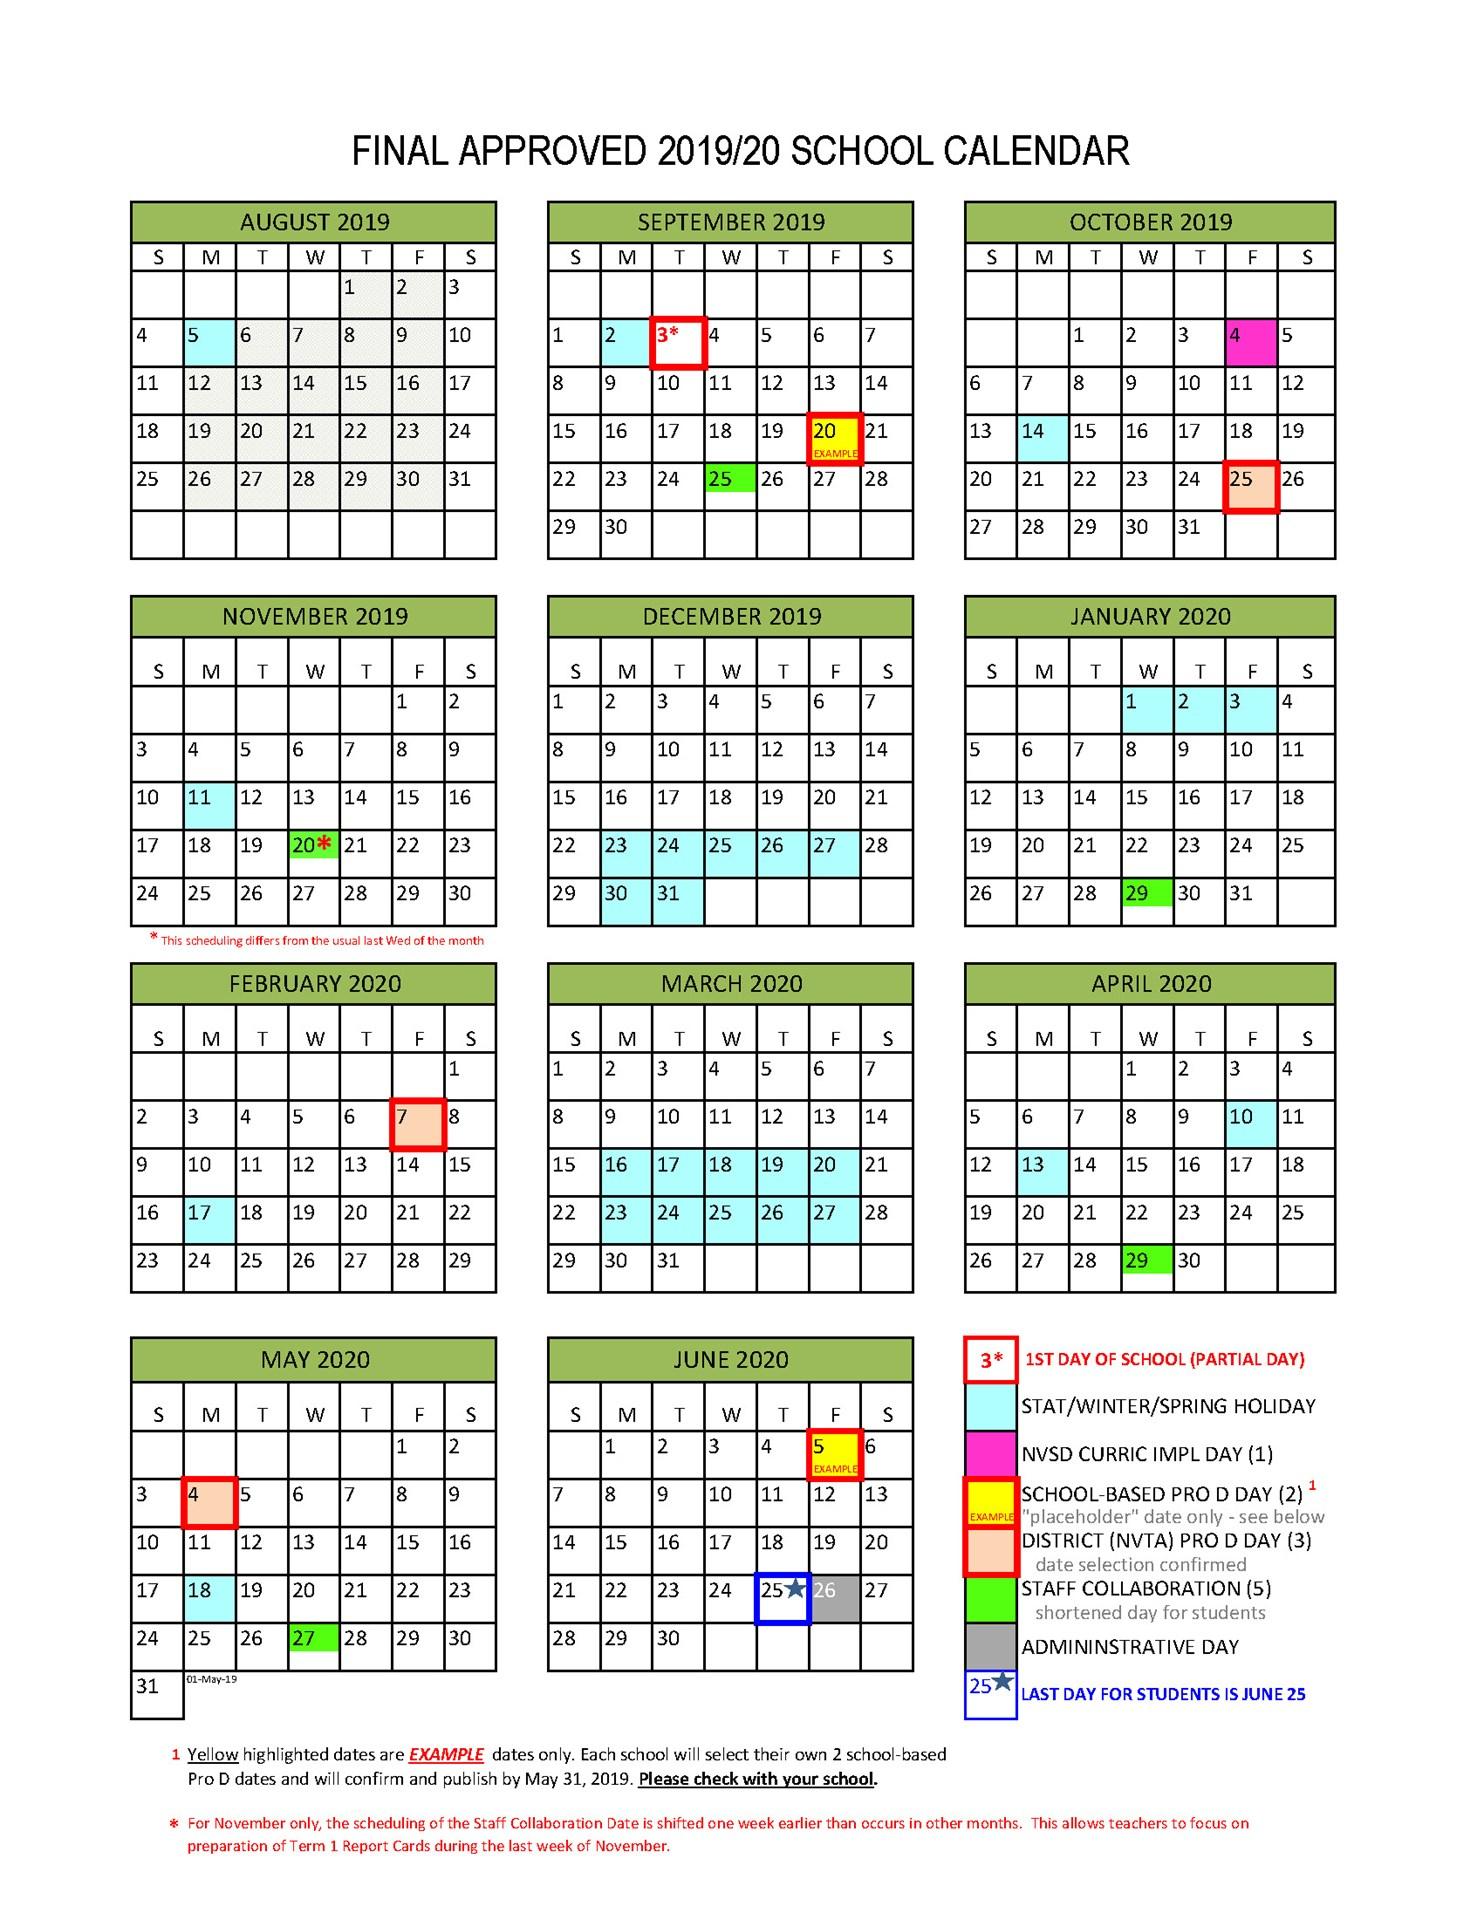 School Calendar 2020-21 | Printable Calendar Free